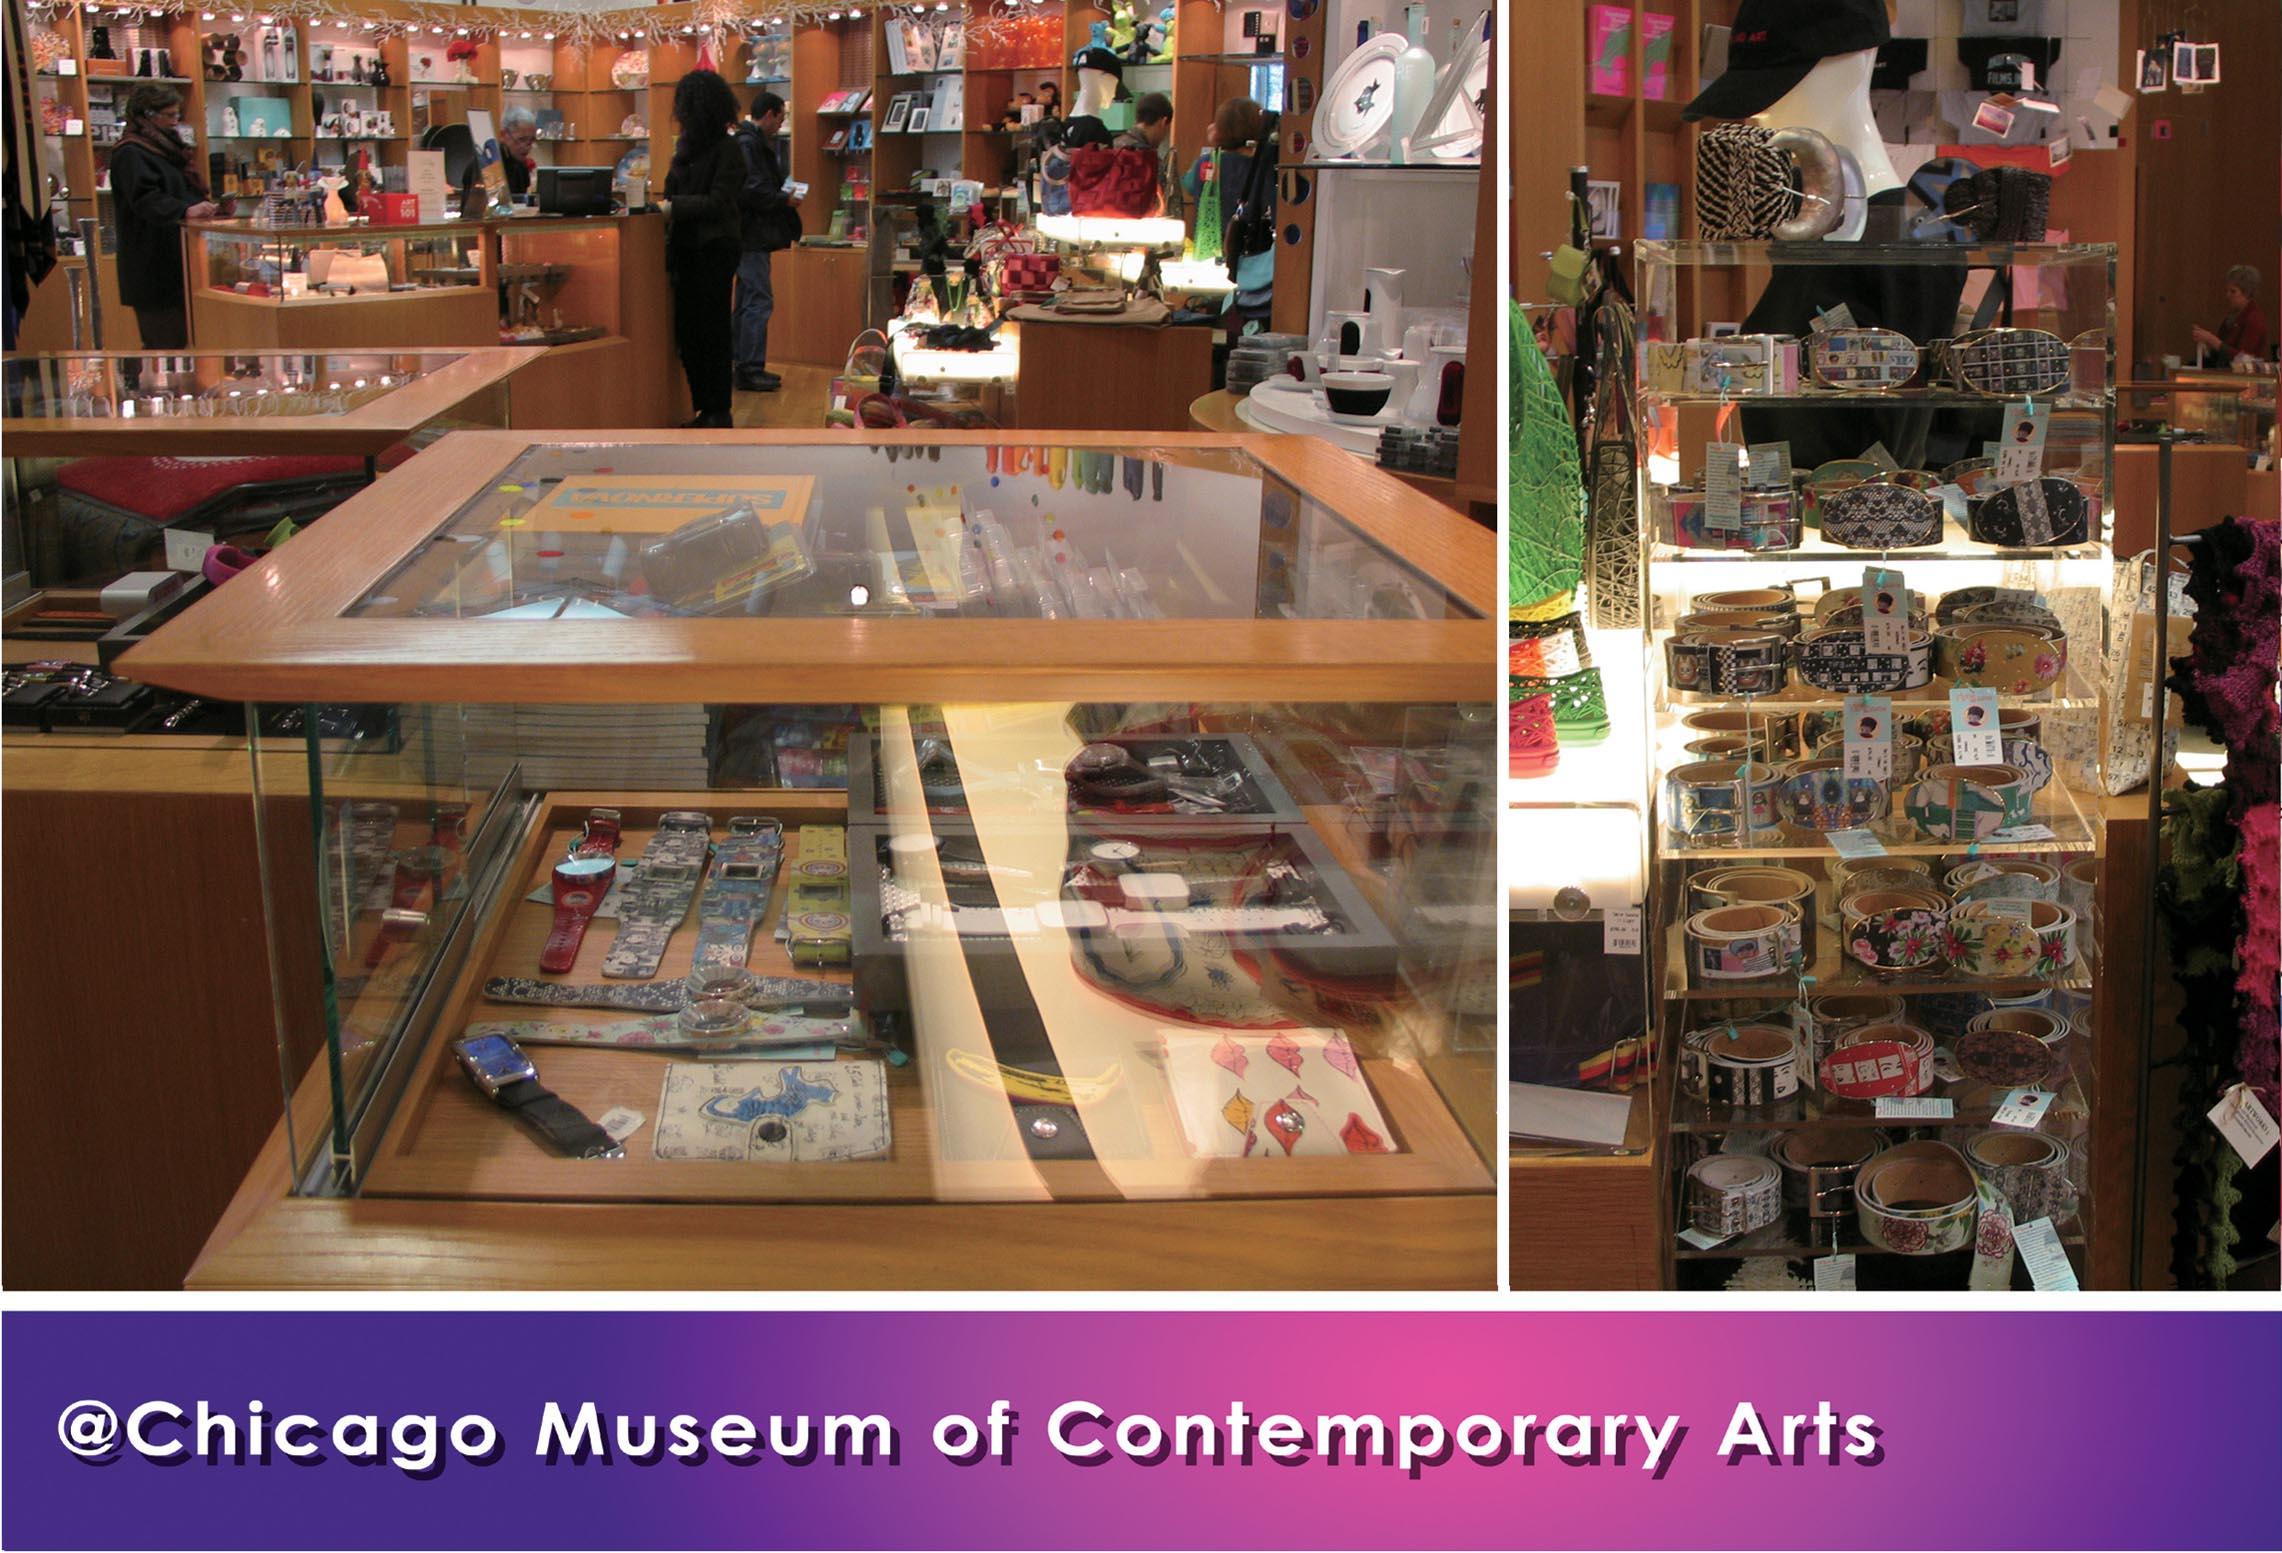 Chicago Museum of Contemporary arts